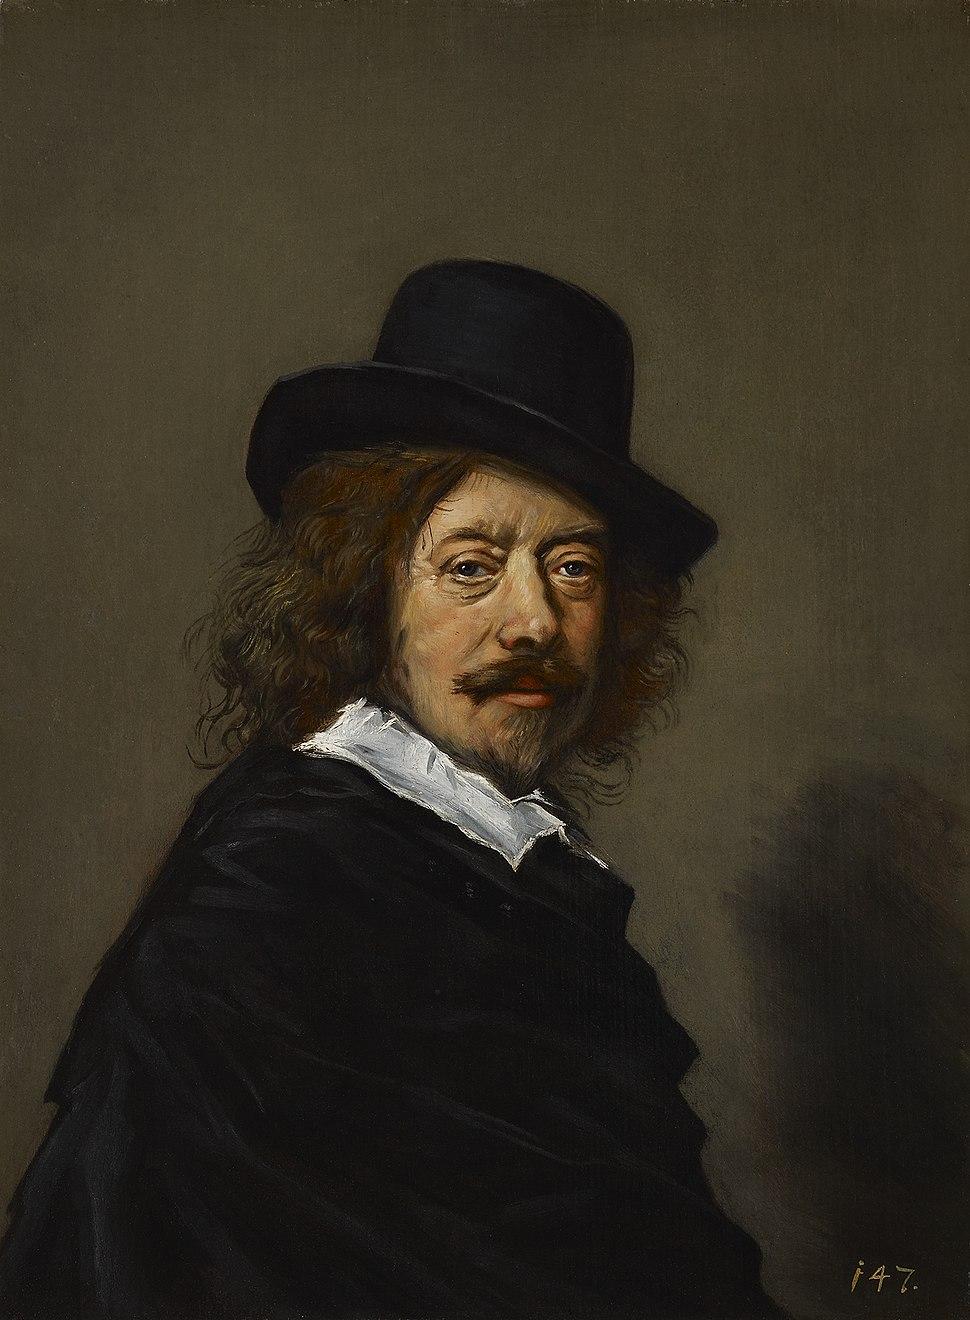 After Frans Hals - Portrait of Frans Hals - Indianapolis